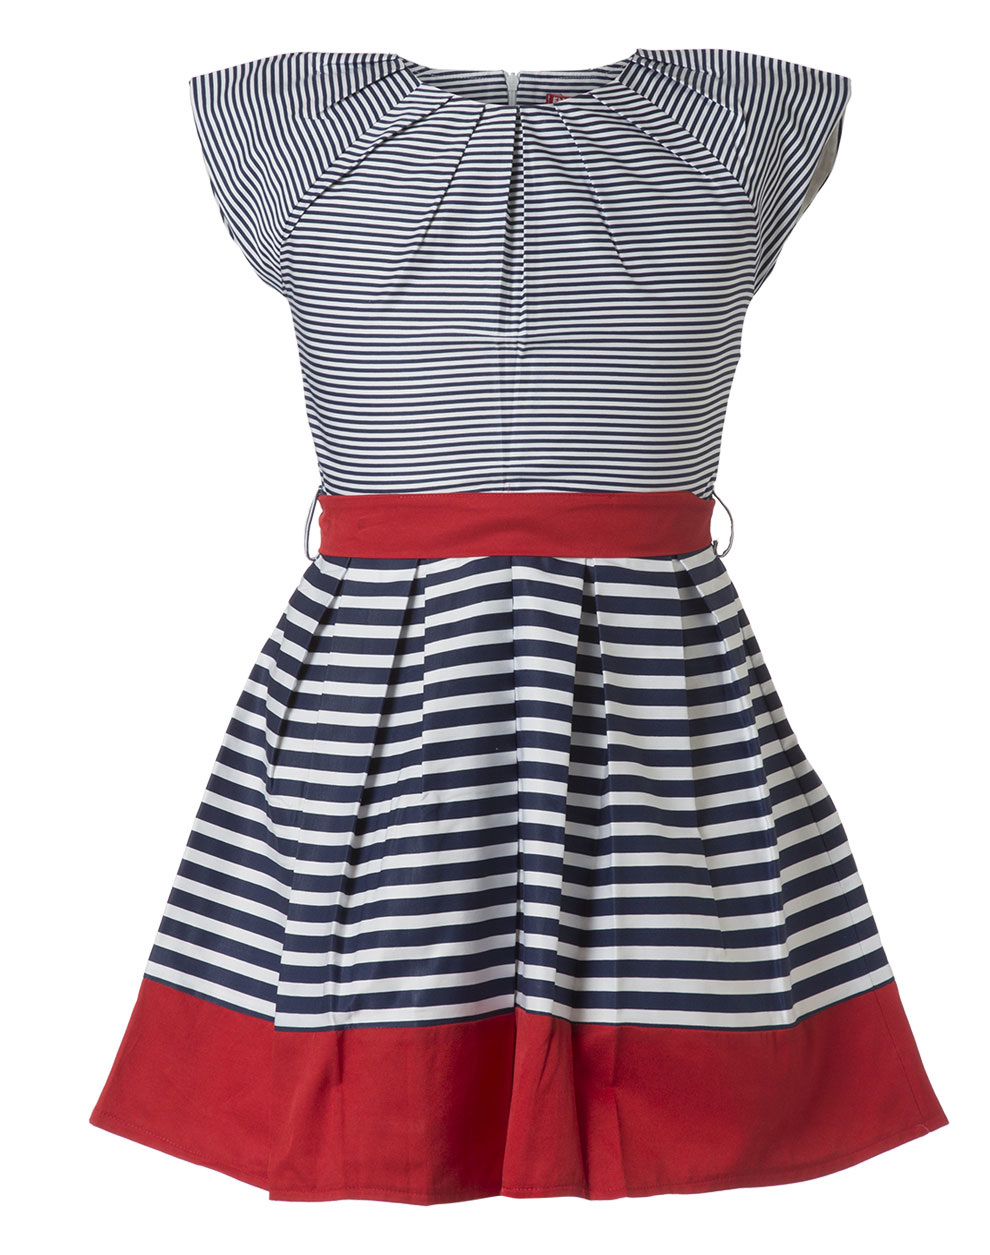 5c45264ef45 Φόρεμα ριγέ με κόκκινες λεπτομέρειες - σταθερό ύφασμα ποπλίνα 16-219225-7 -  ΡΙΓΕ - 14044-144/ 12/ 312/ 116